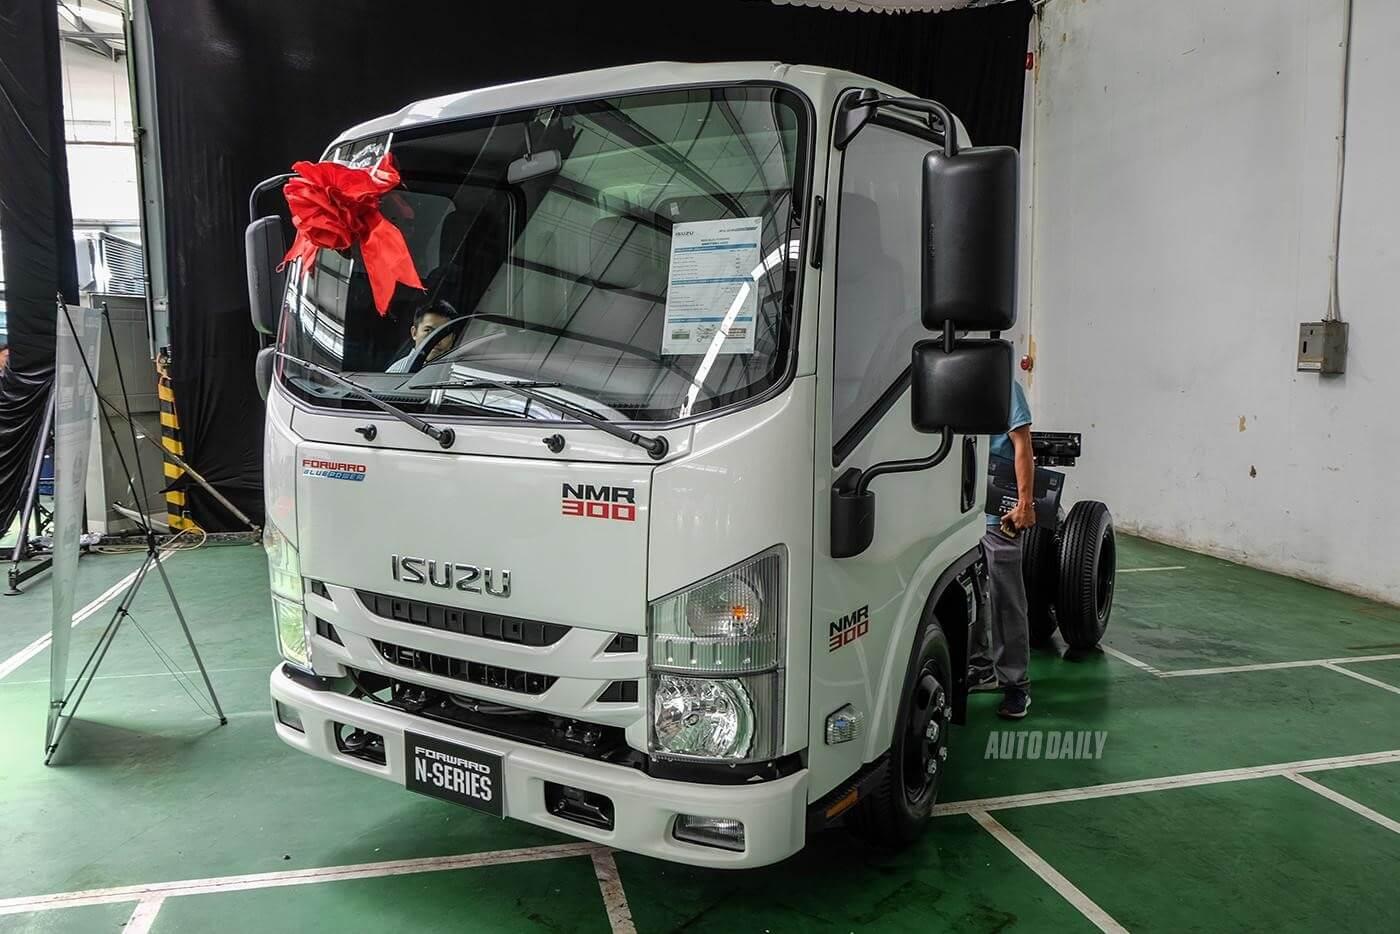 2008 Isuzu Nseries Gaspowered Trucks Now Available